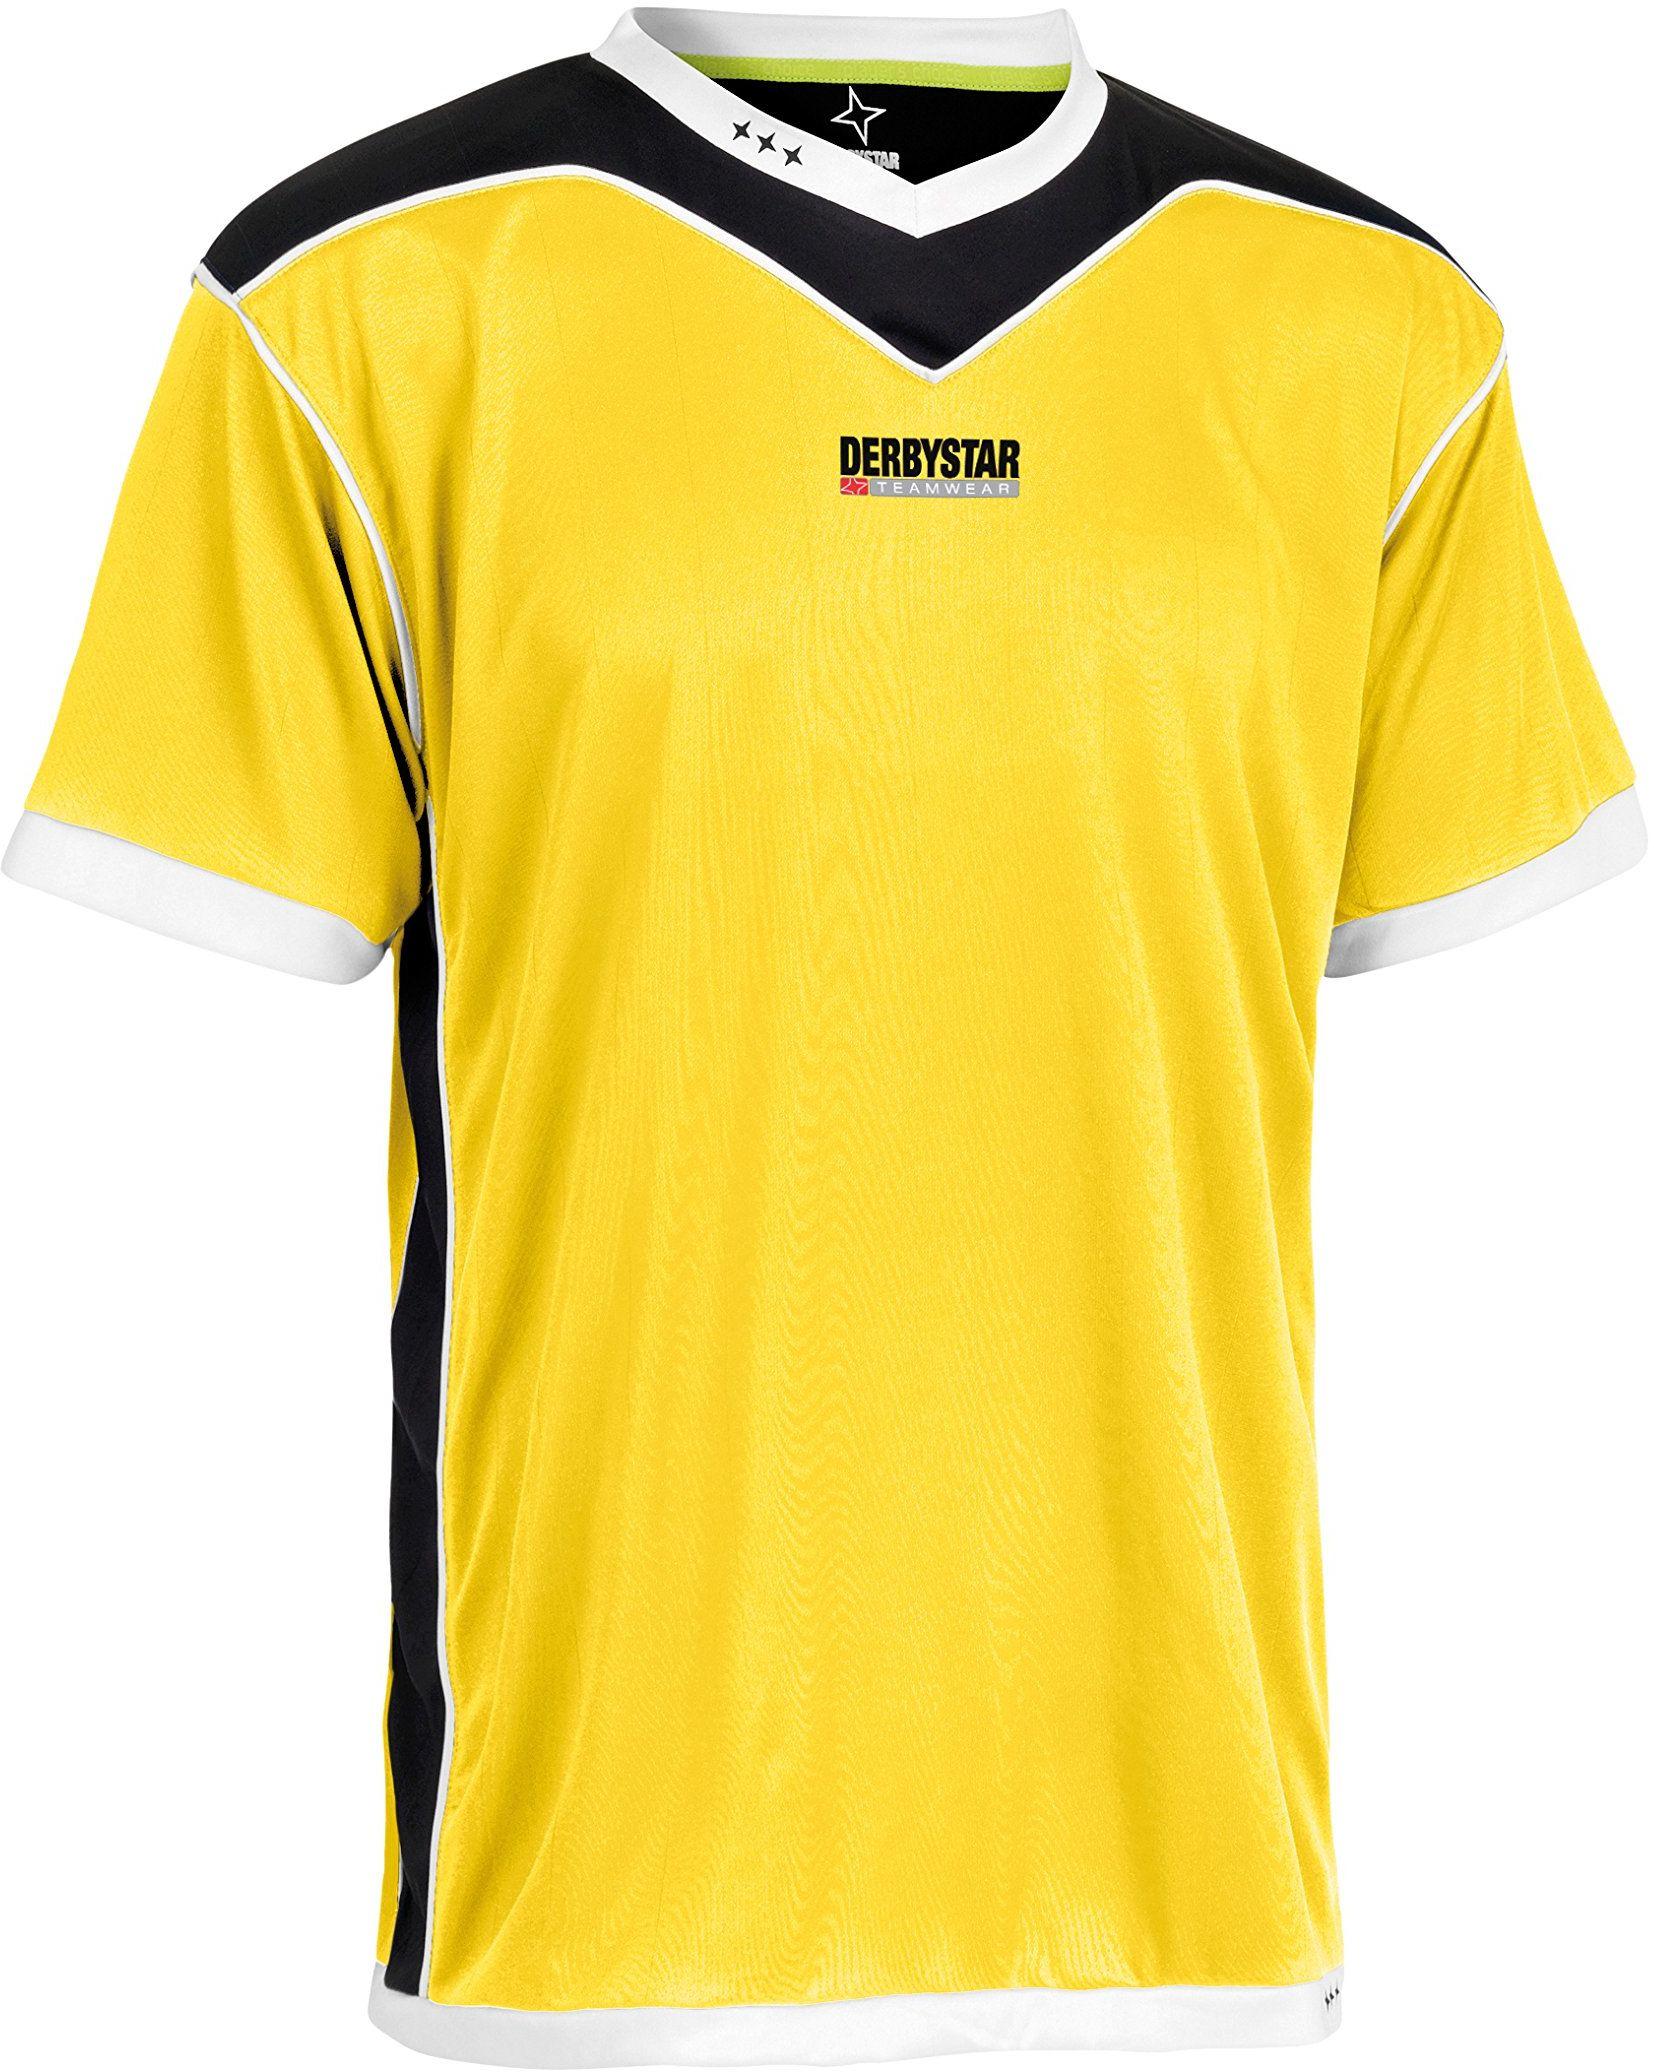 Derbystar koszulka Brillant krótka, M, żółta czarna, 6000040520